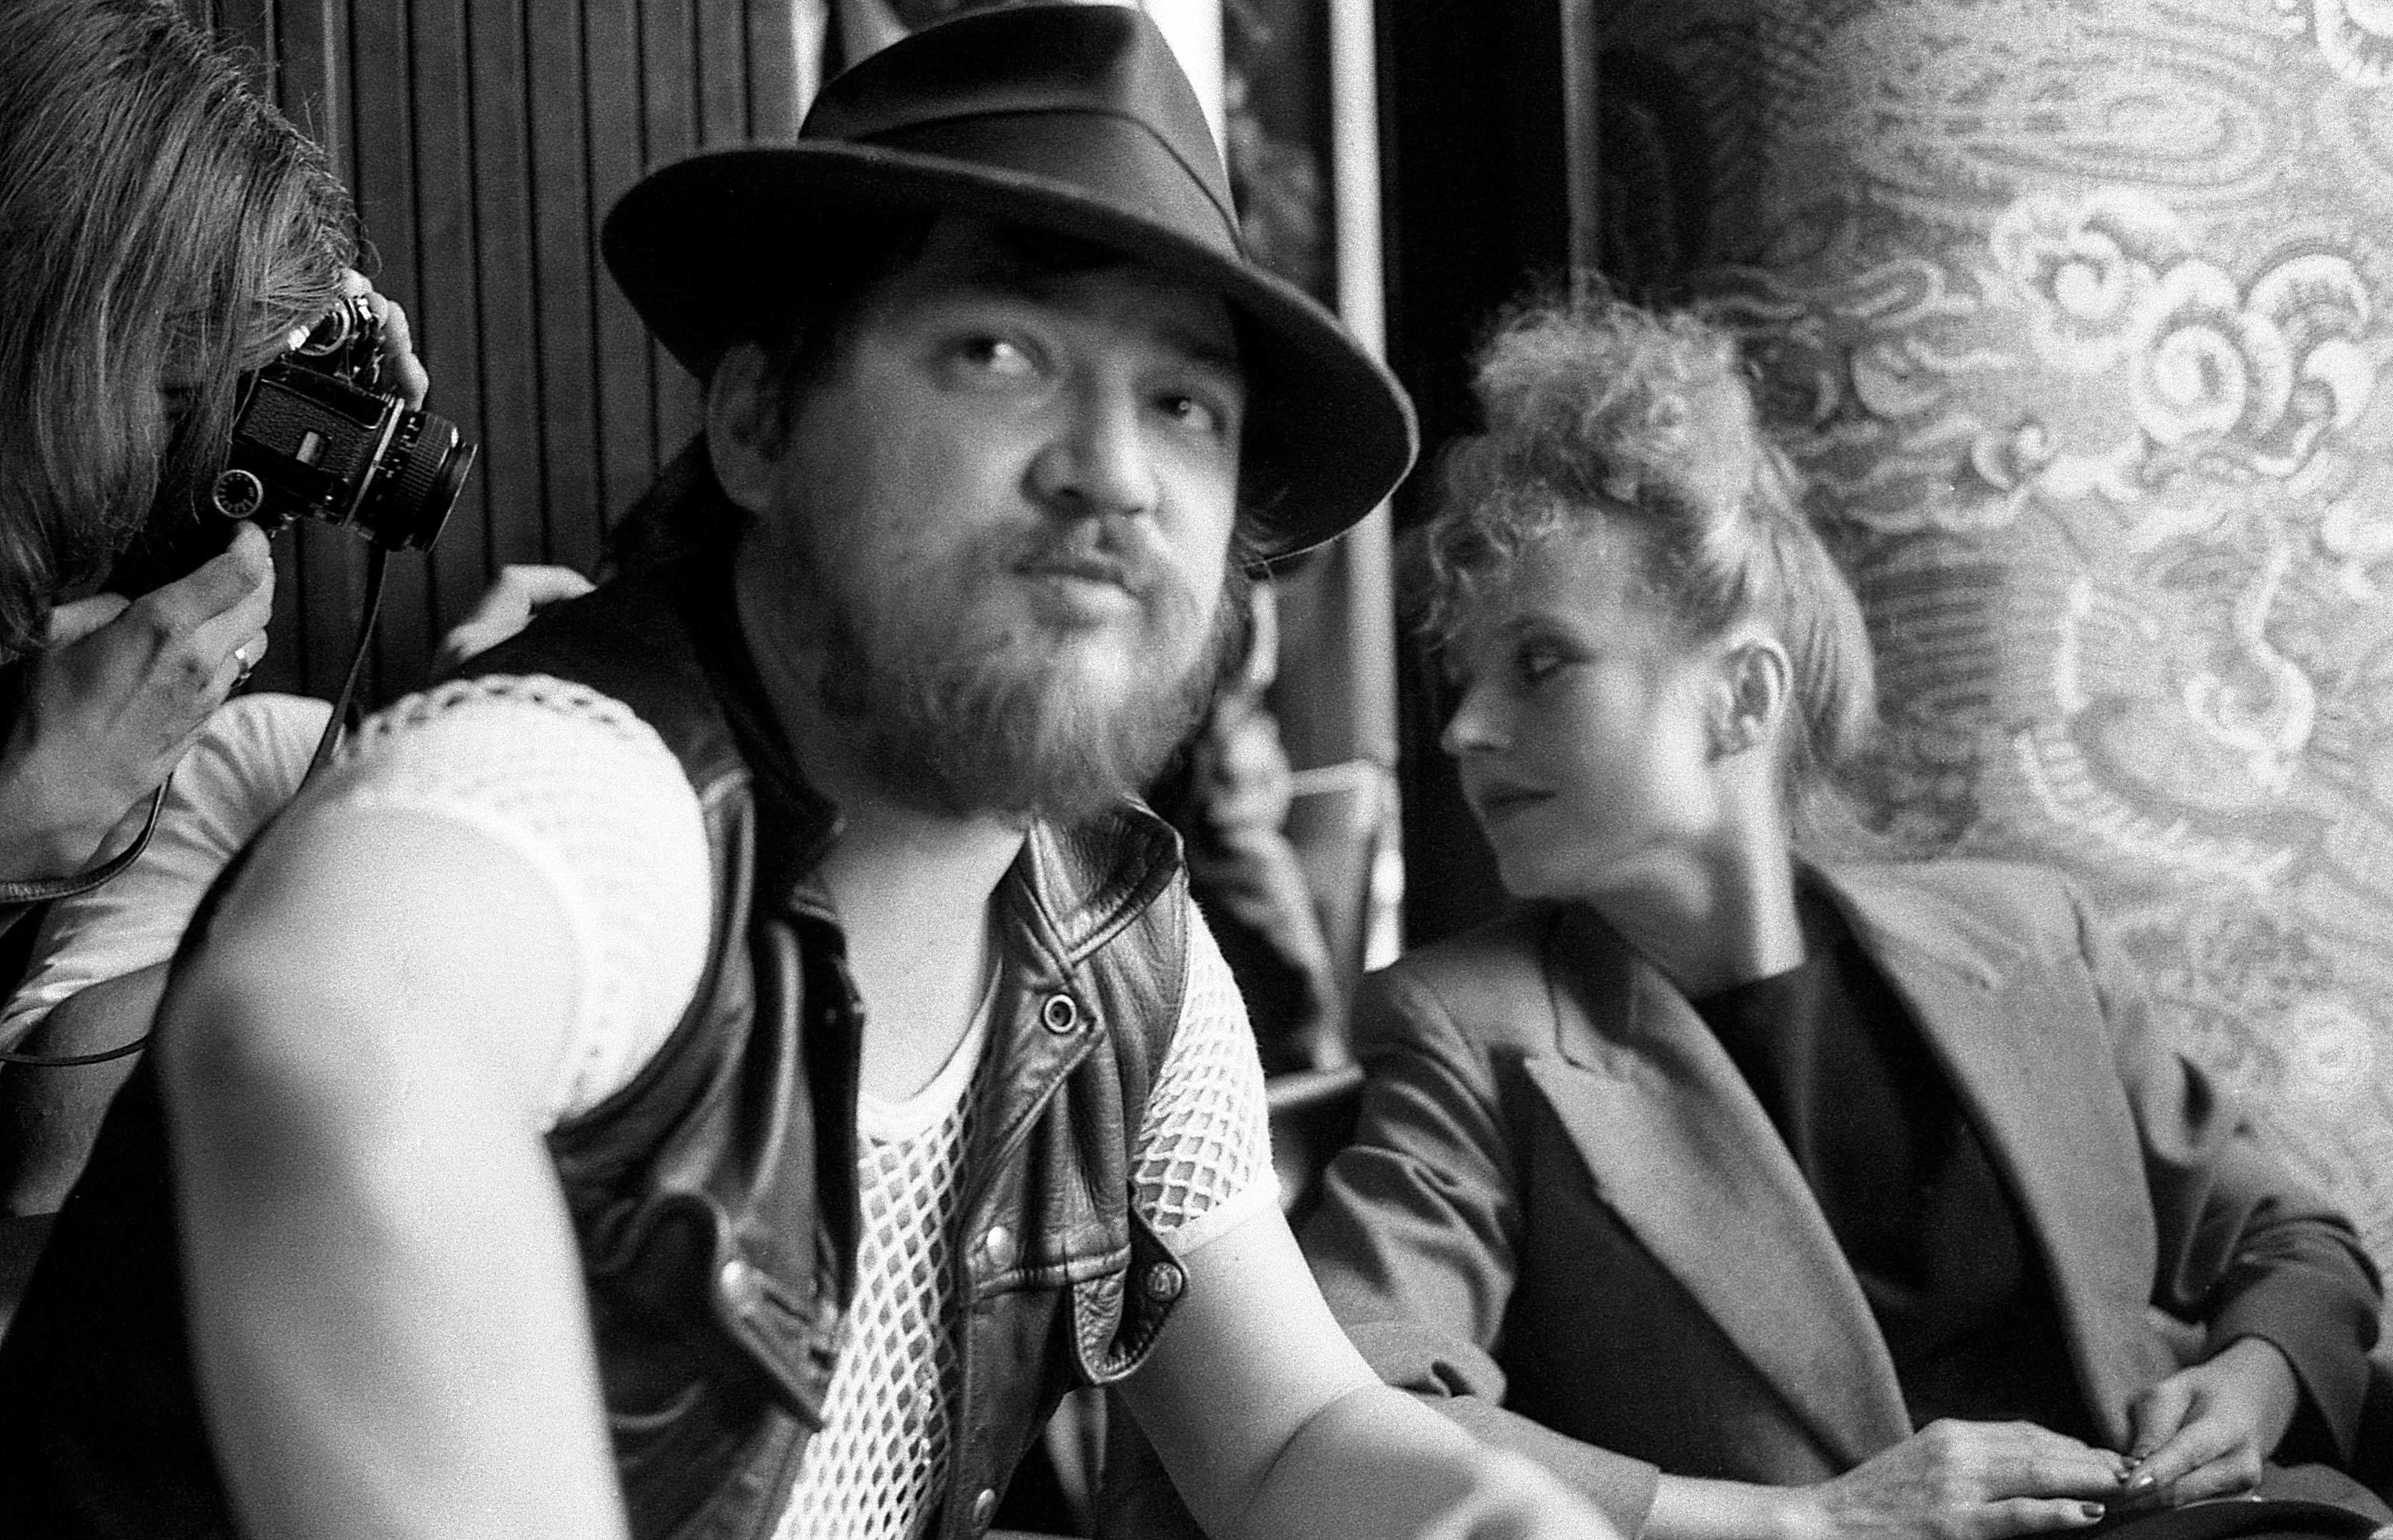 Retrospectiva sobre el cineasta alemany Rainer W. Fassbinder